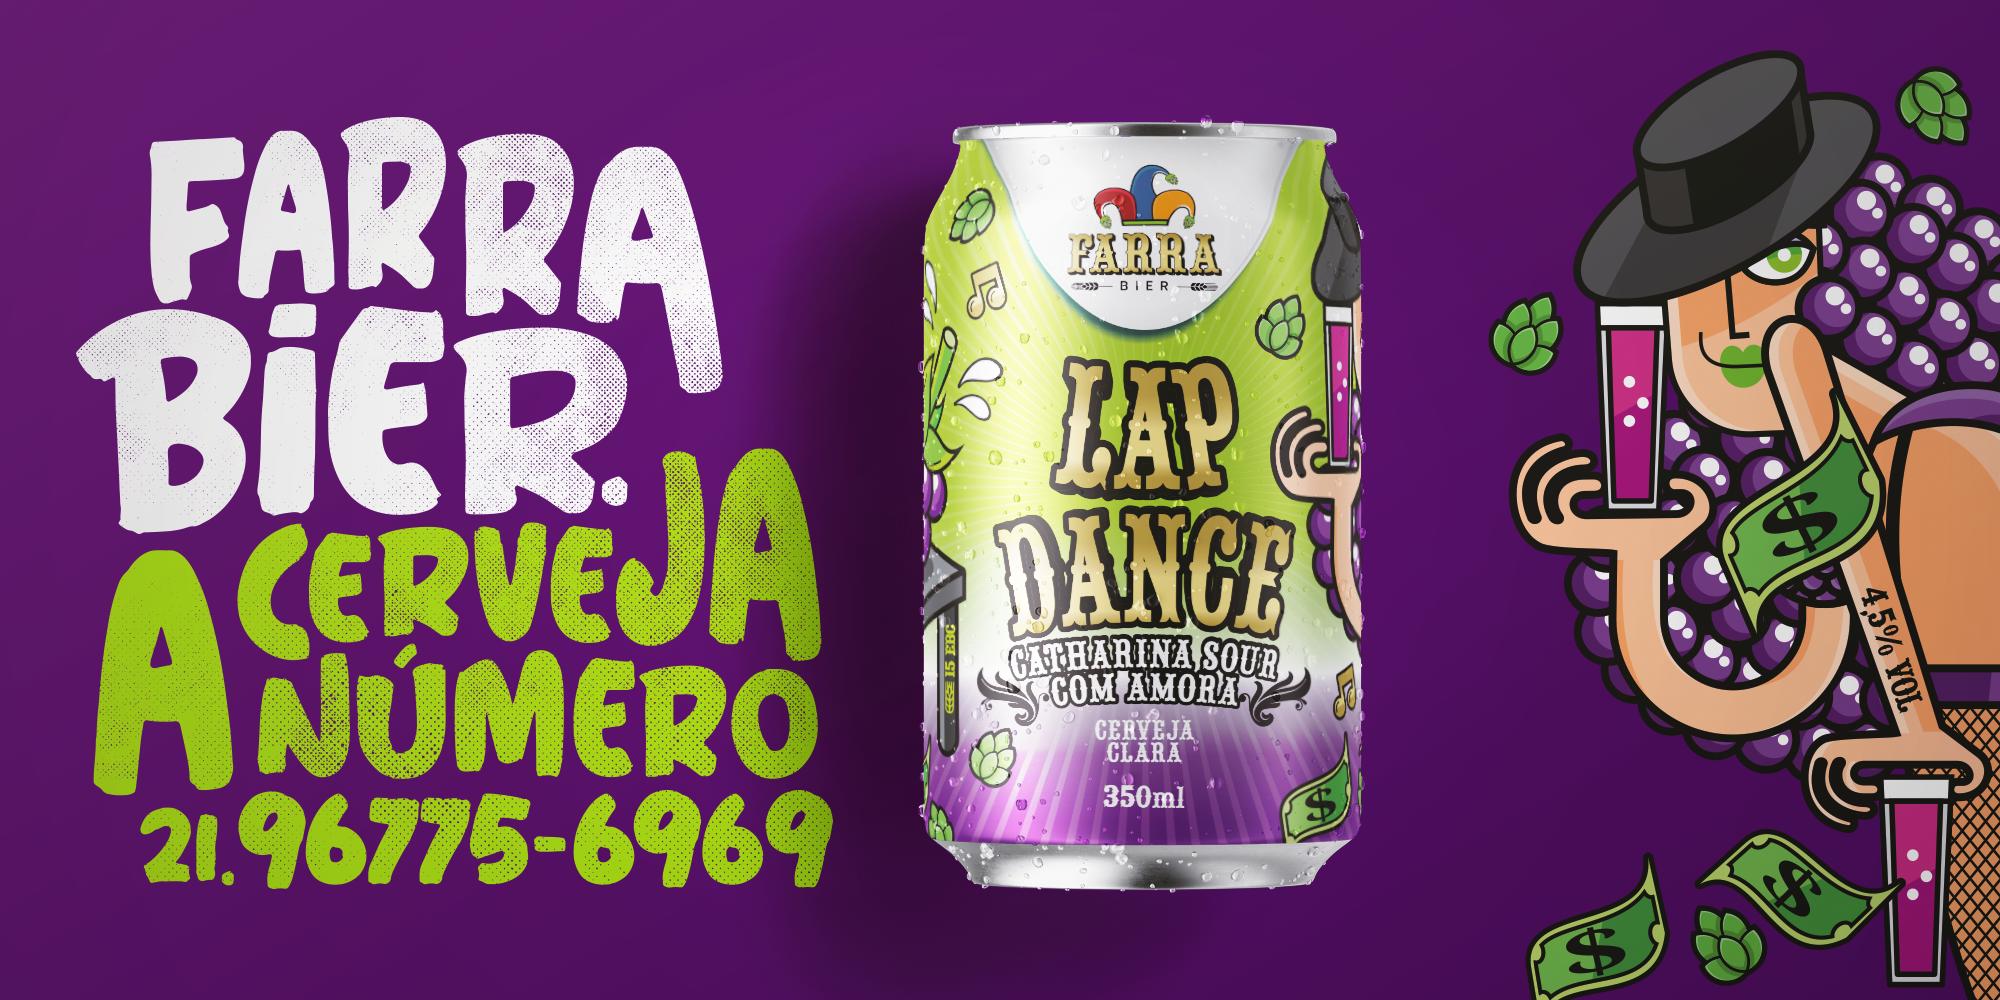 Banca_Farra-2000x1000_Lap-Dance-2